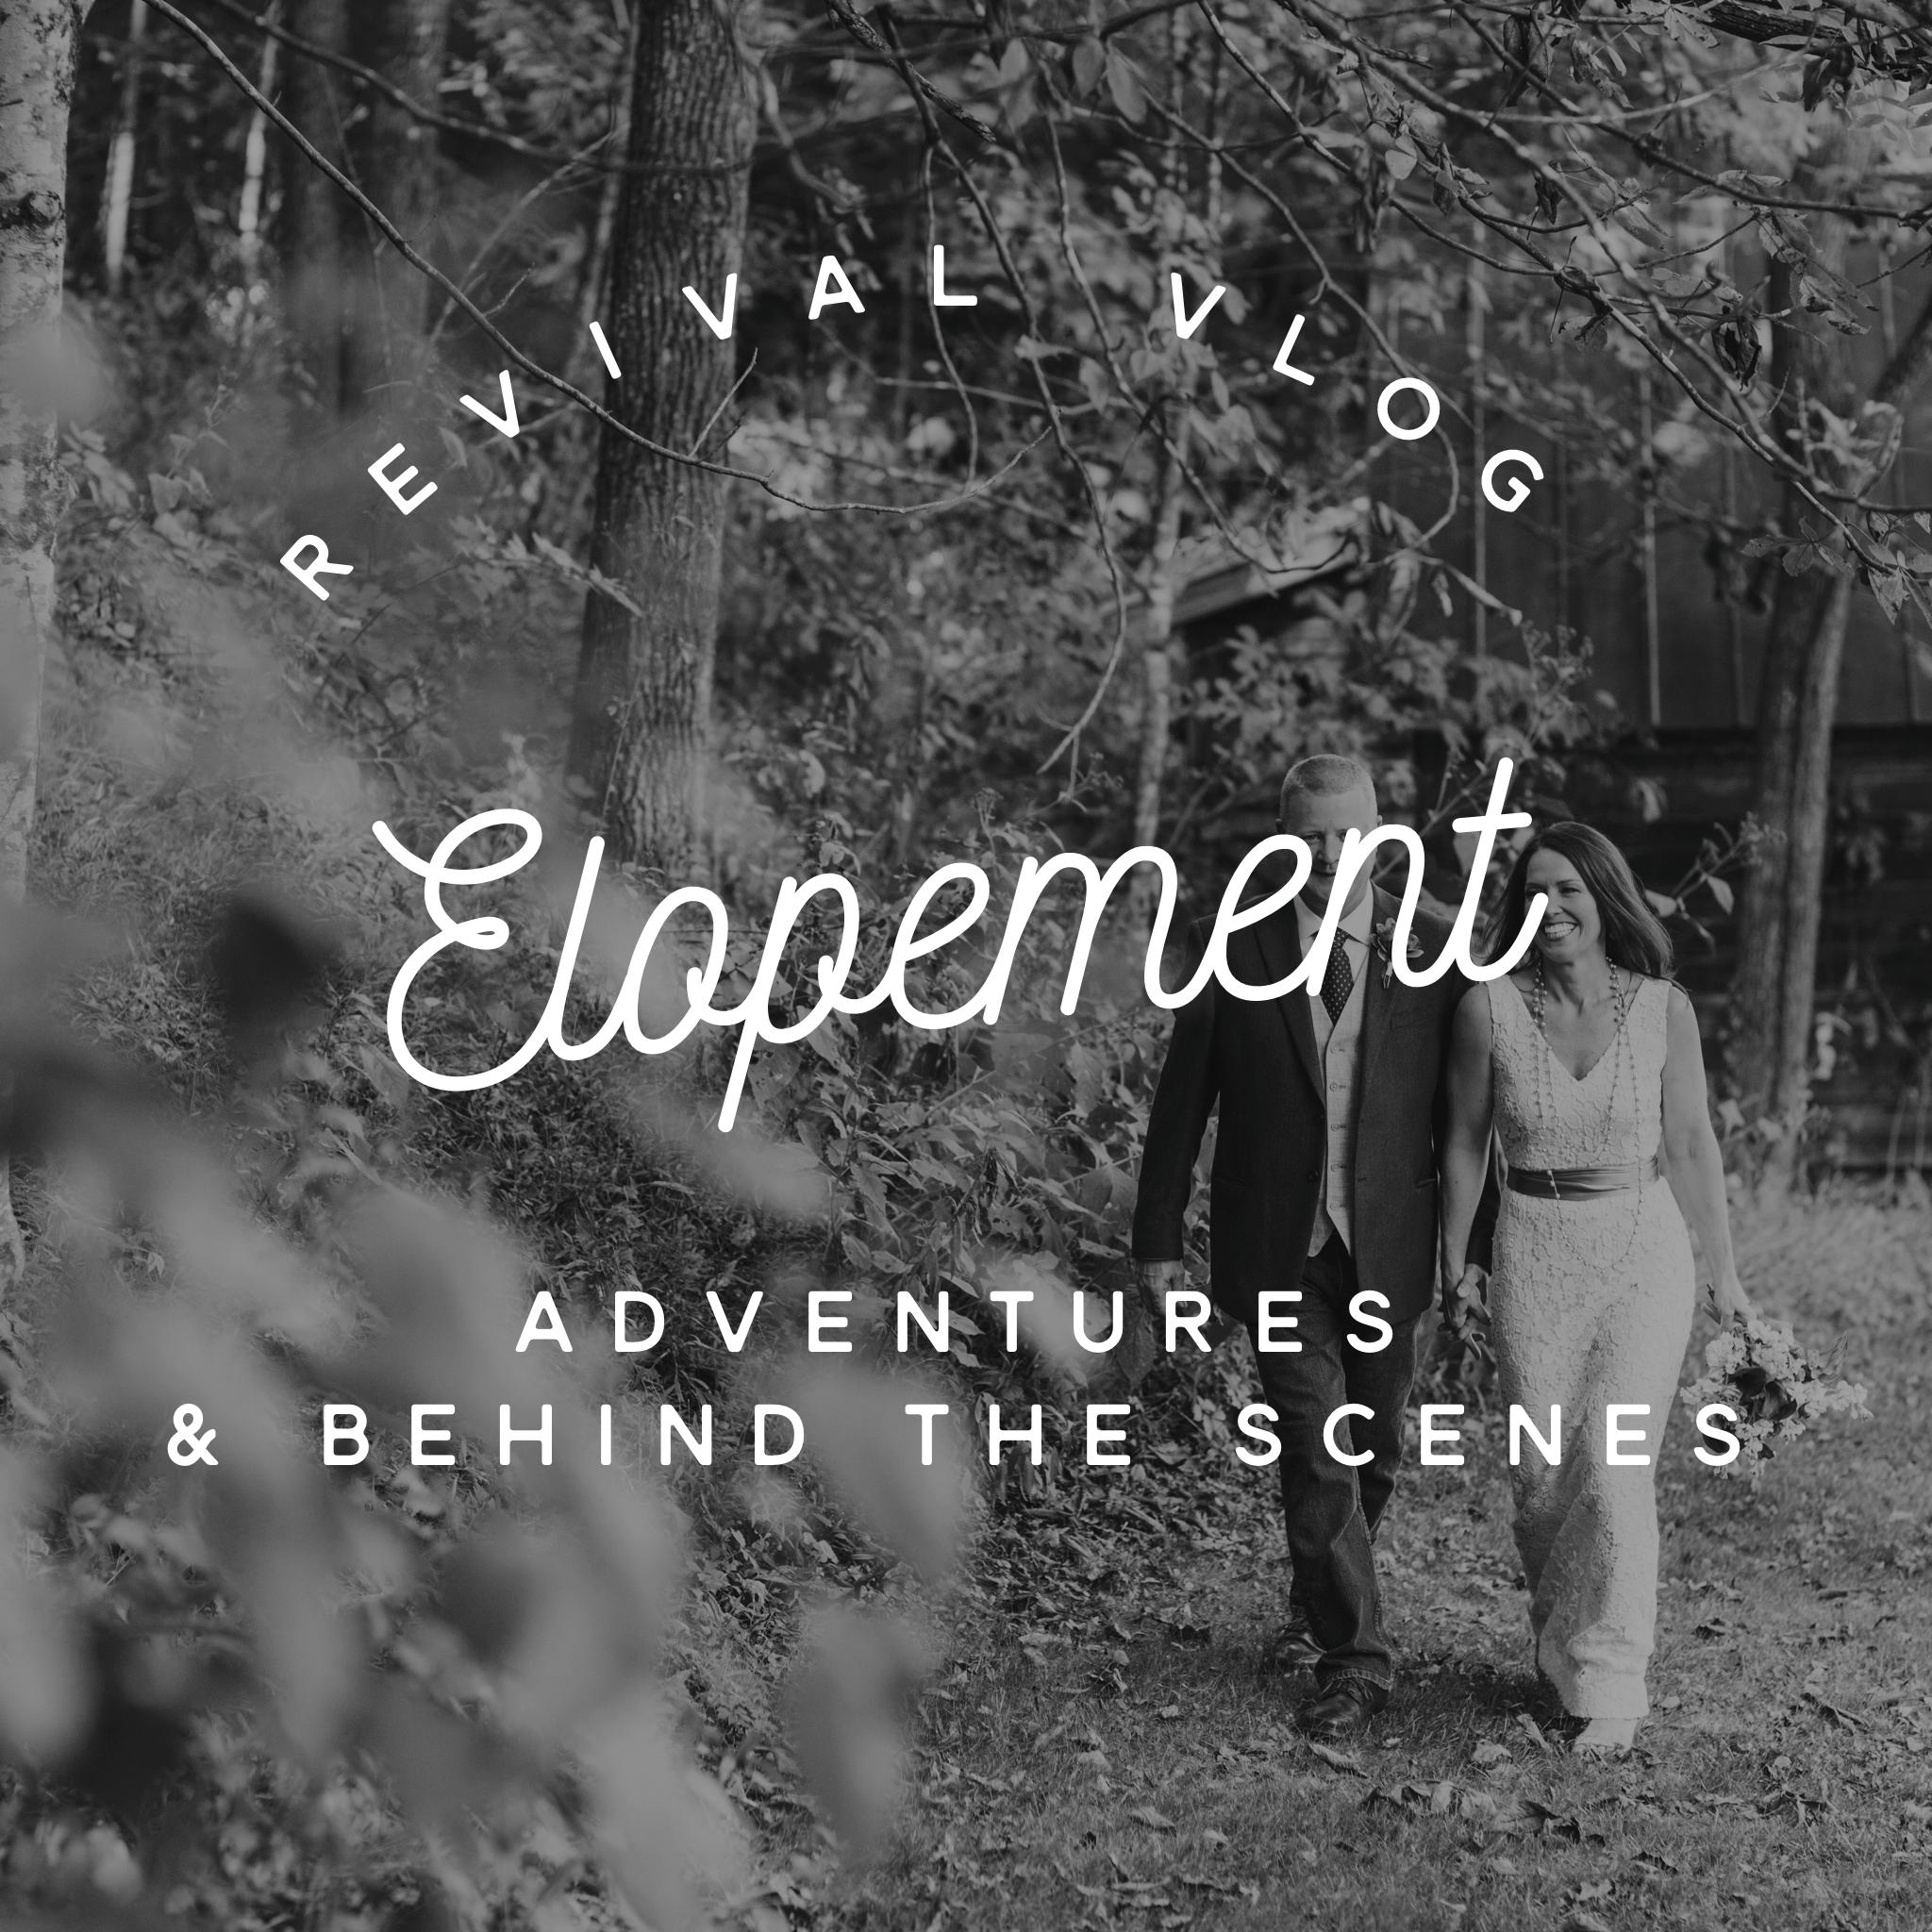 Revival Vlog: Elopement Adventures at The Mast Farm Inn 10.5.16